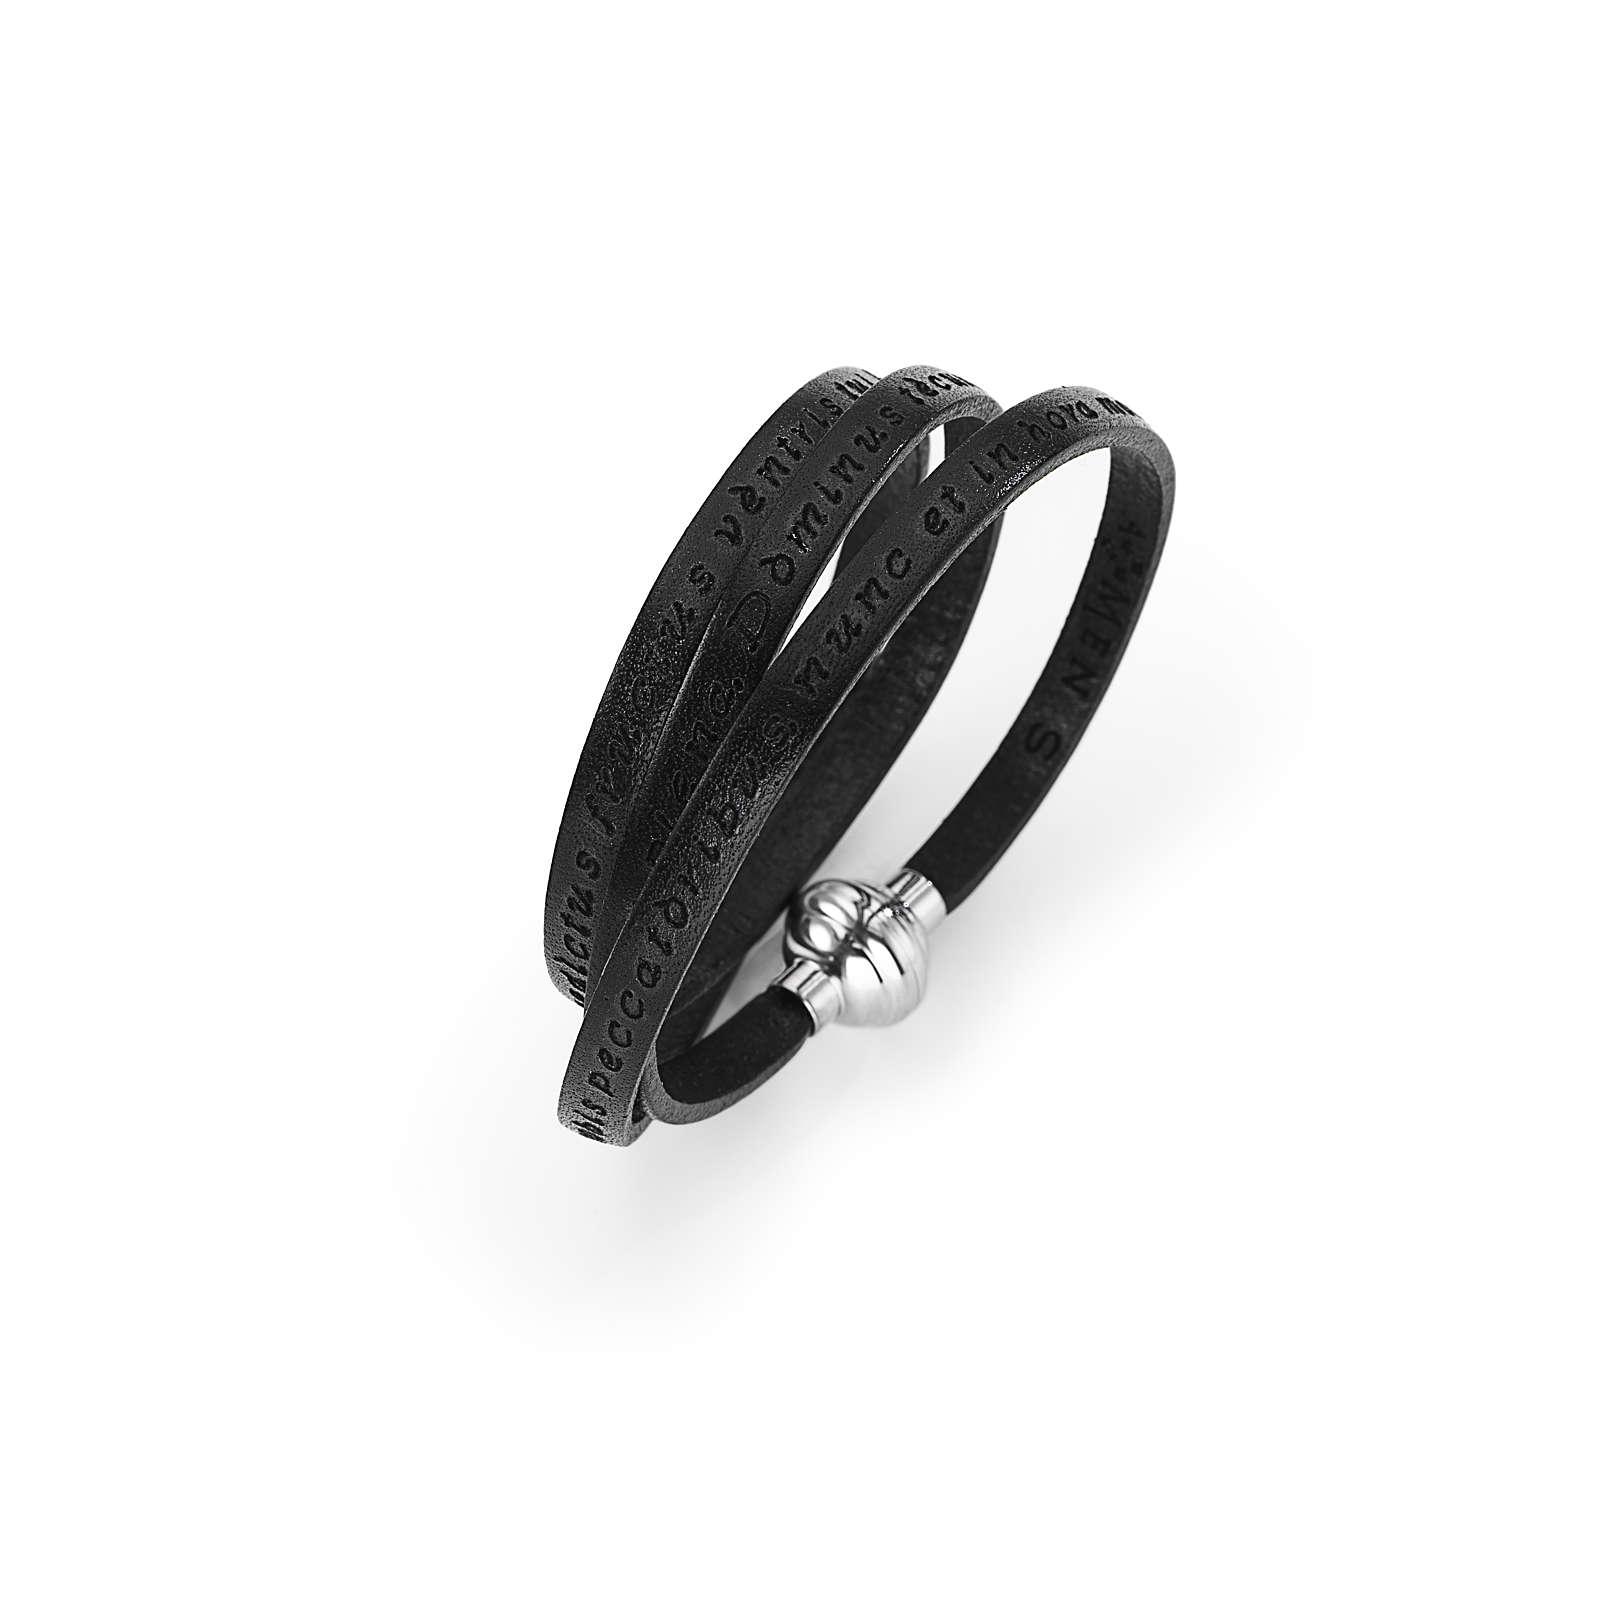 Amen Bracelet in black leather Hail Mary LAT 4